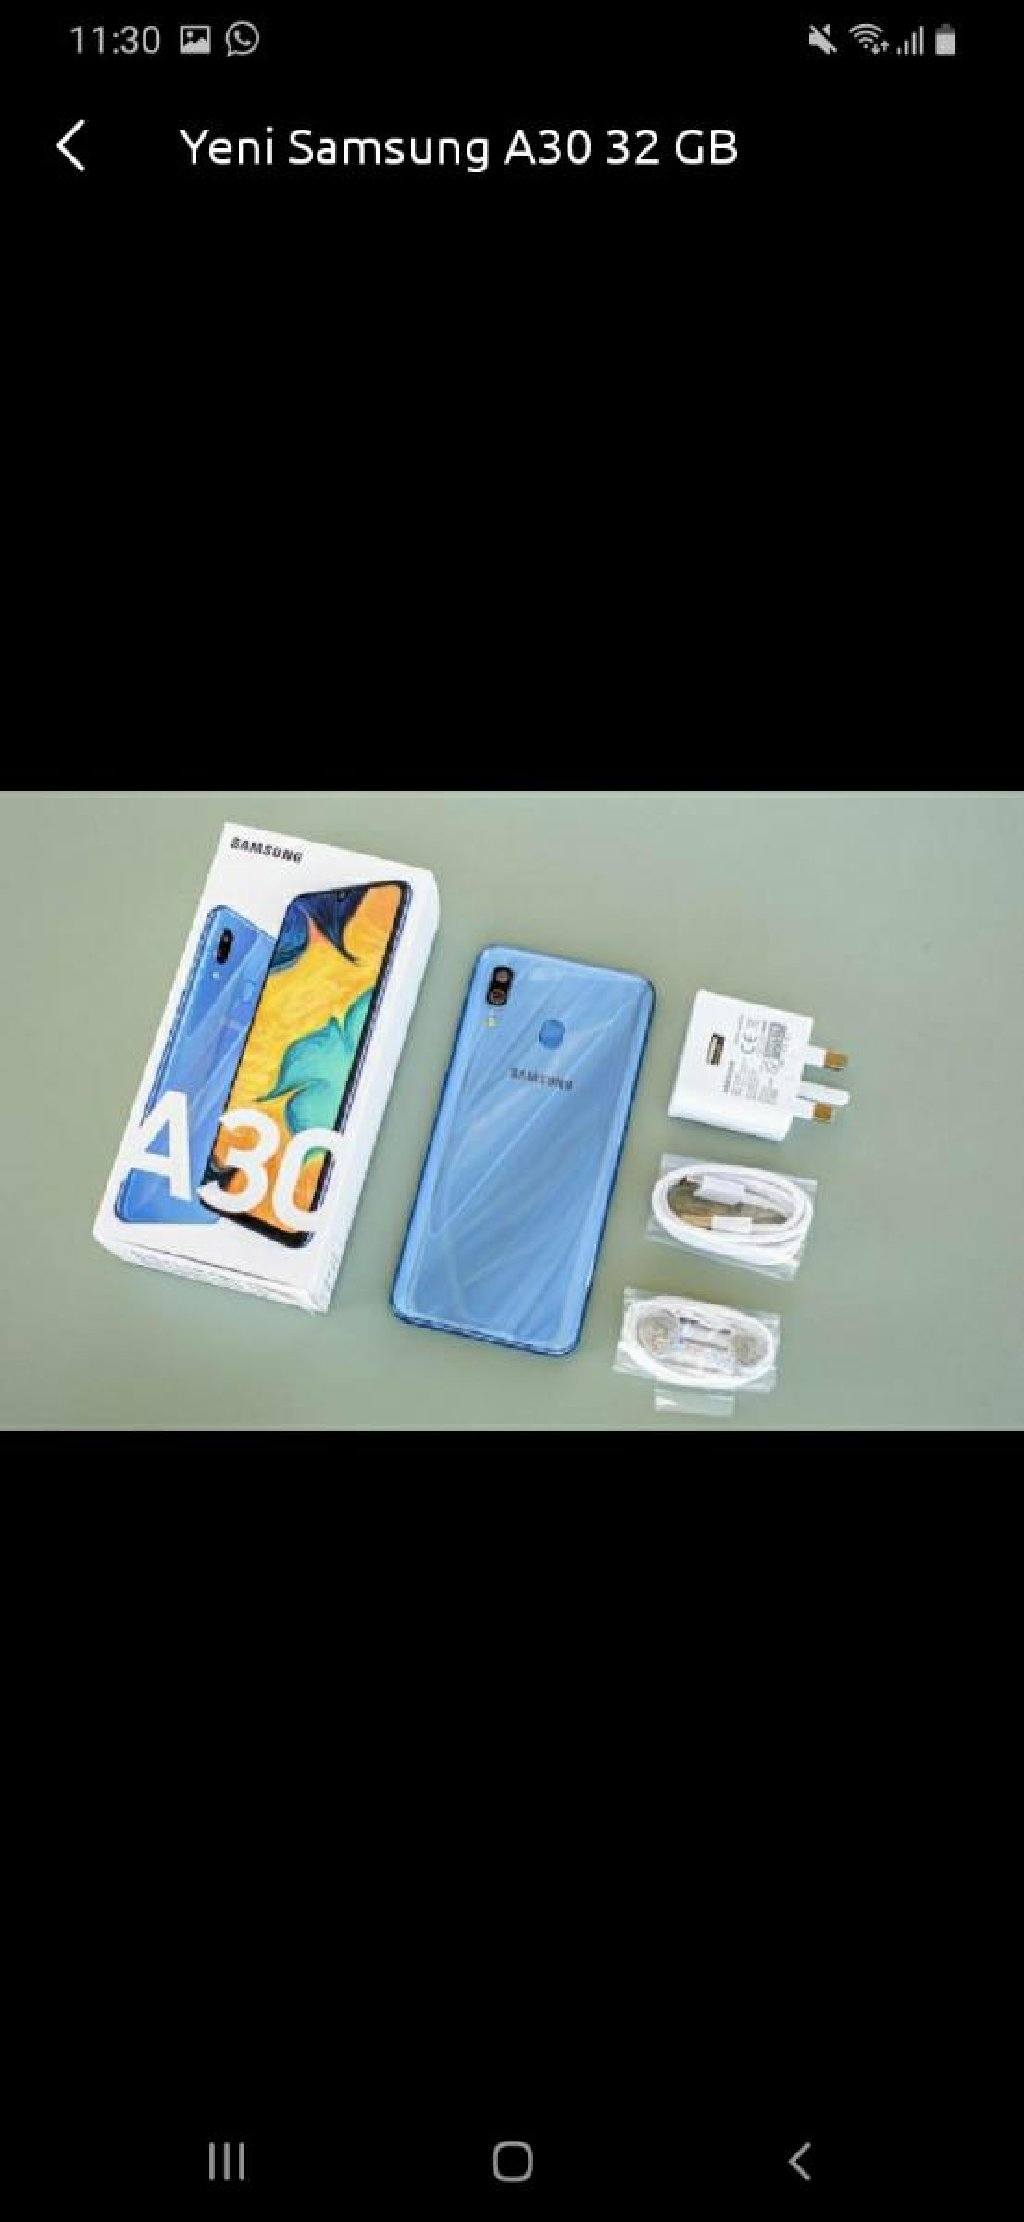 Yeni Samsung A30s 128 GB